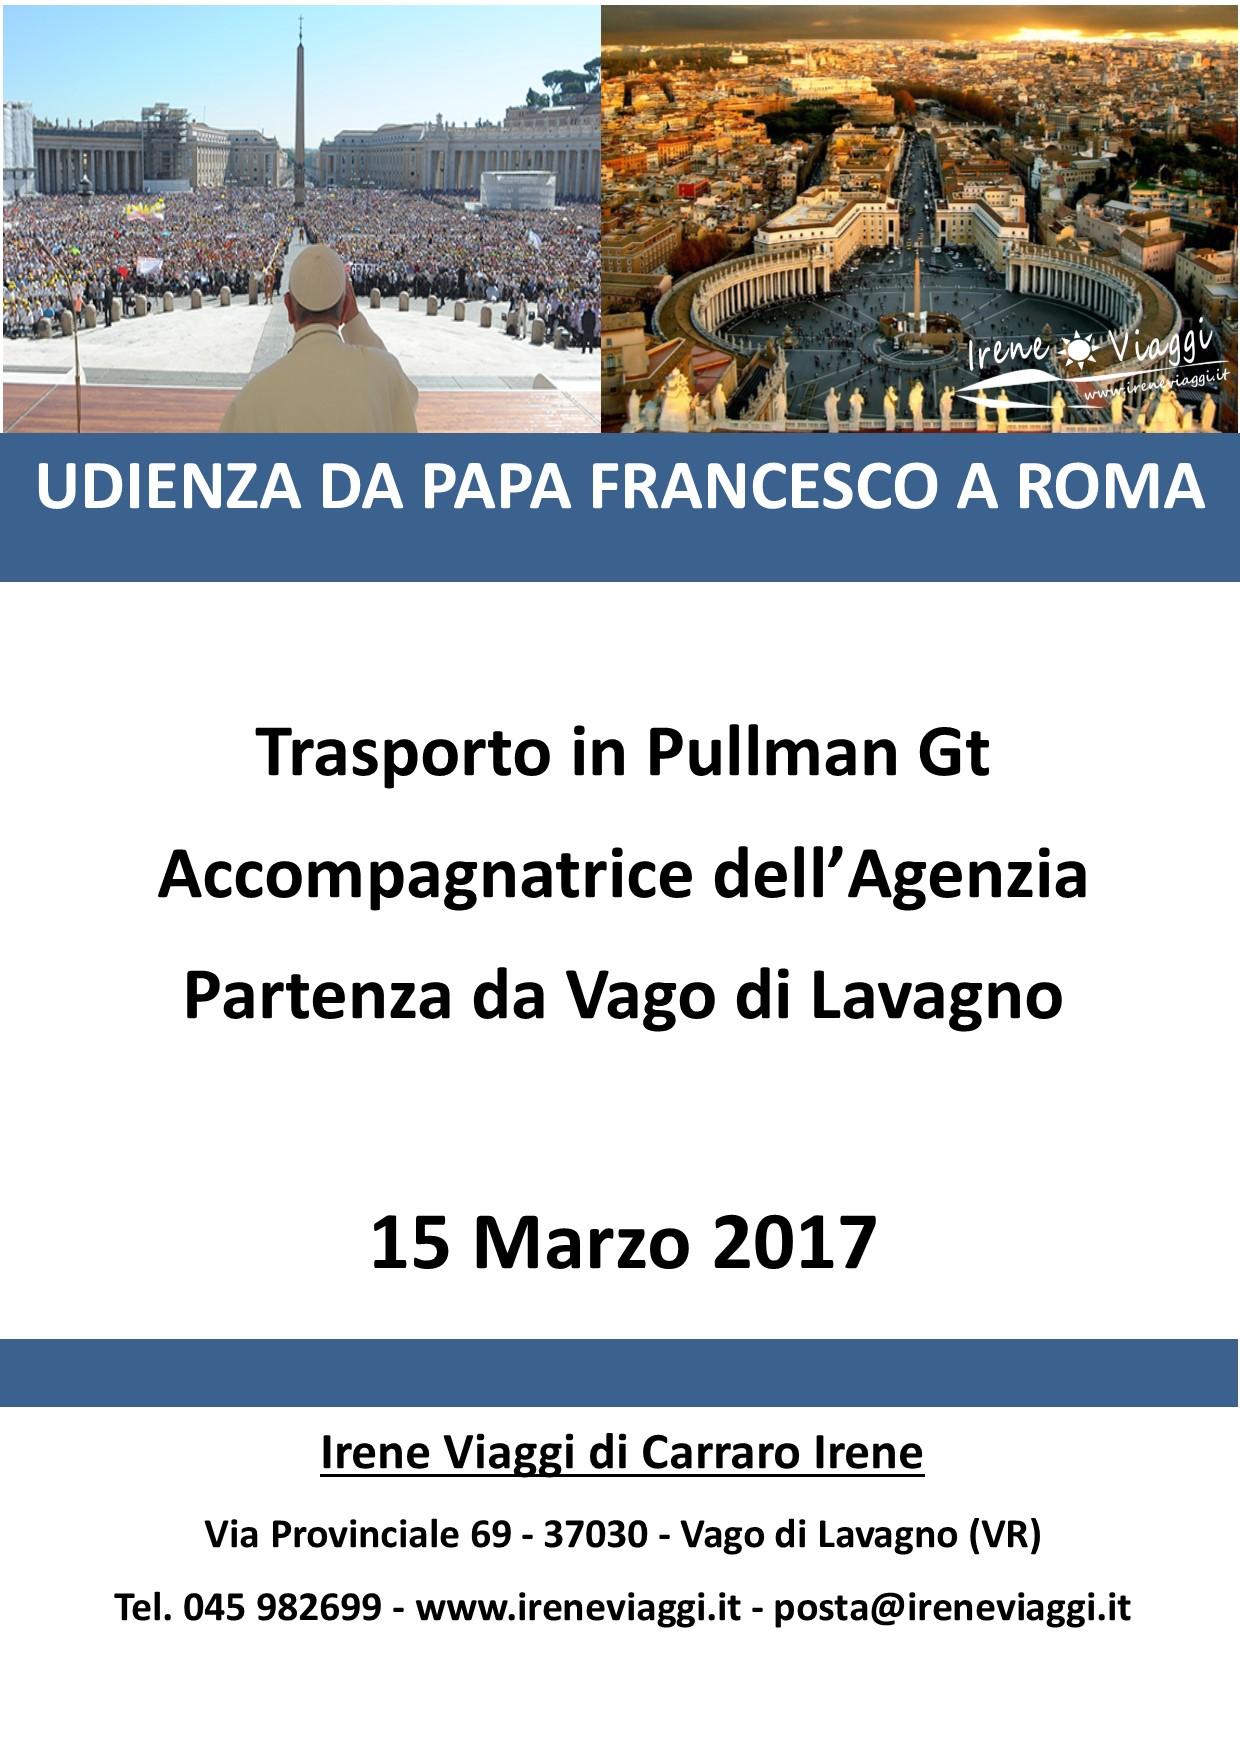 Udienza da Papa Francesco a Roma